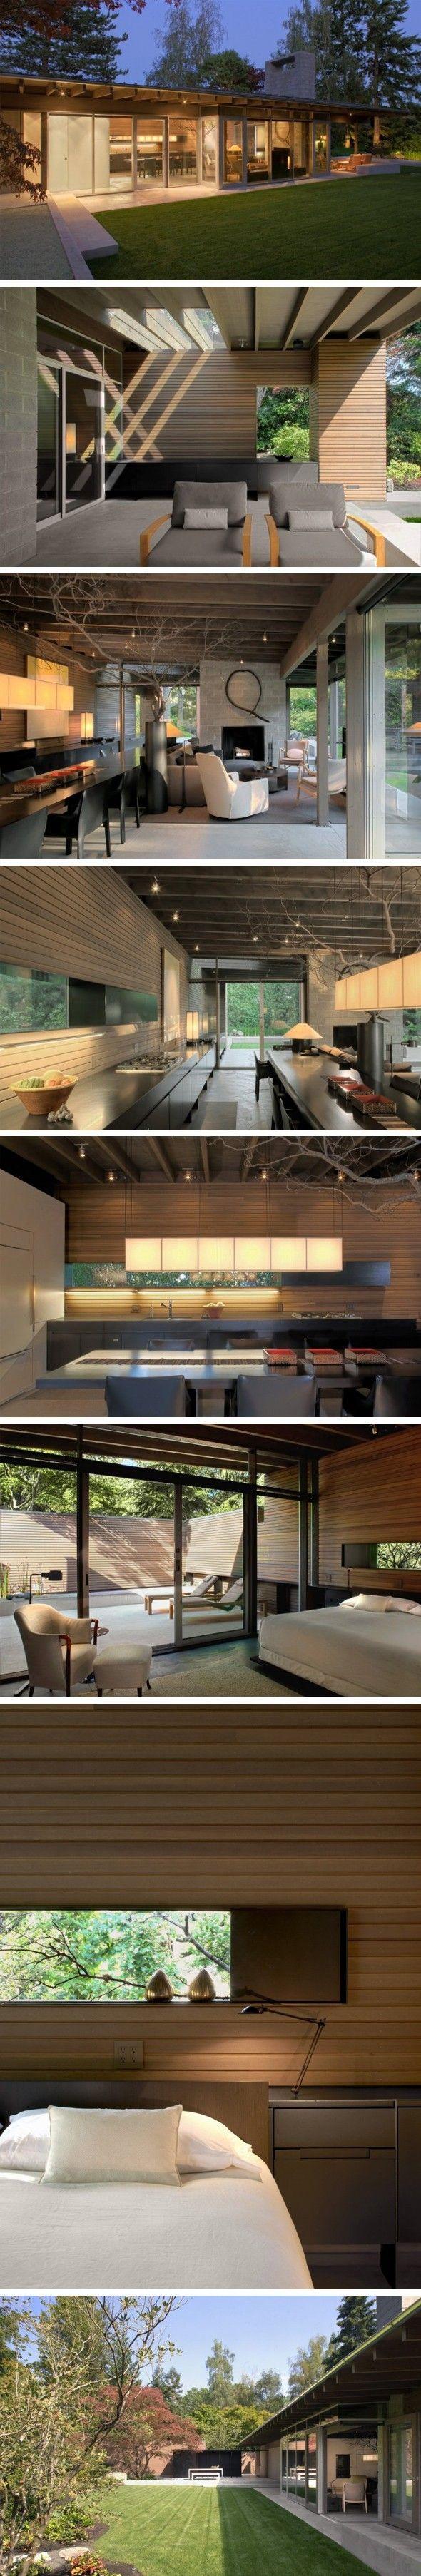 Urban Suyama Peterson Deguchi by Cabin - Journal of Design